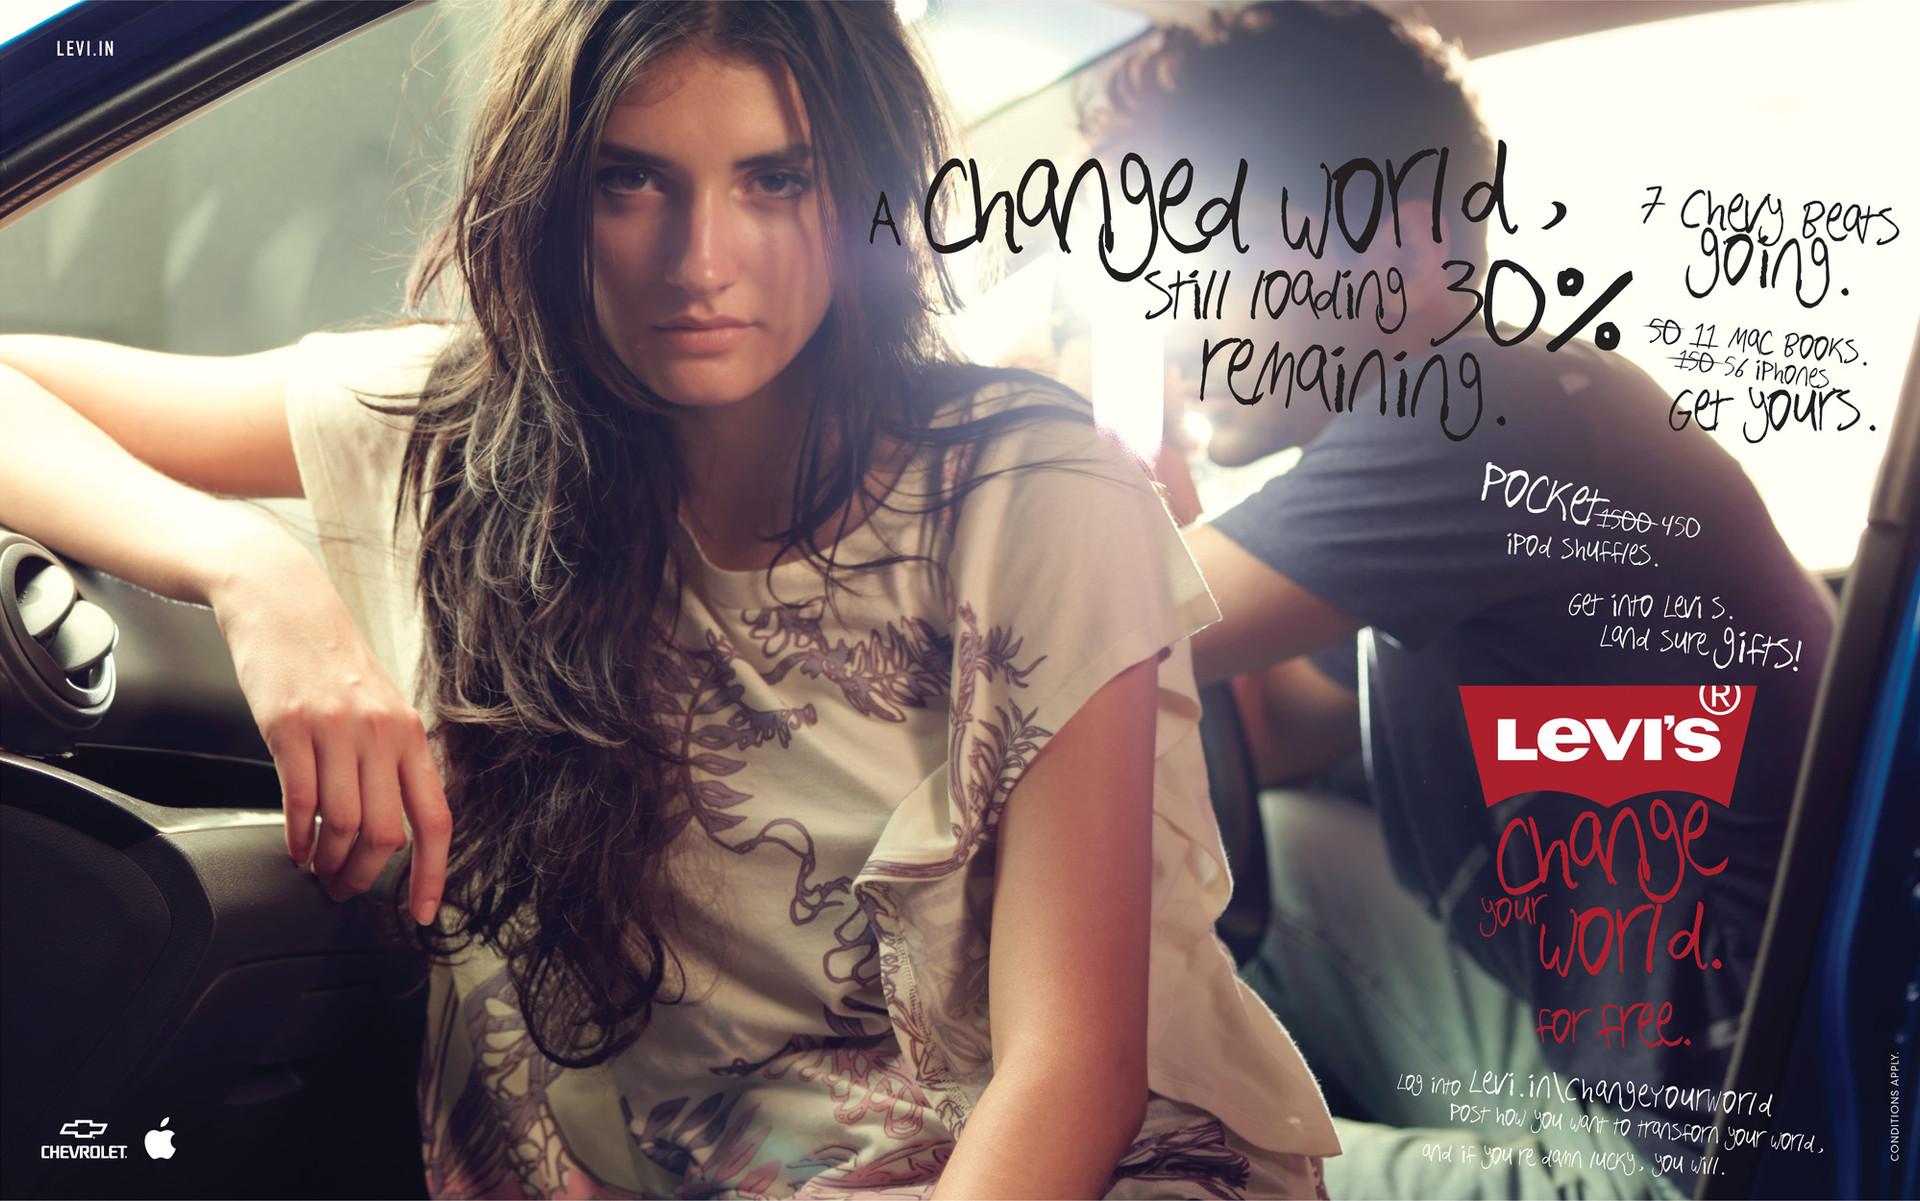 Levis - Change Your World-04.jpg